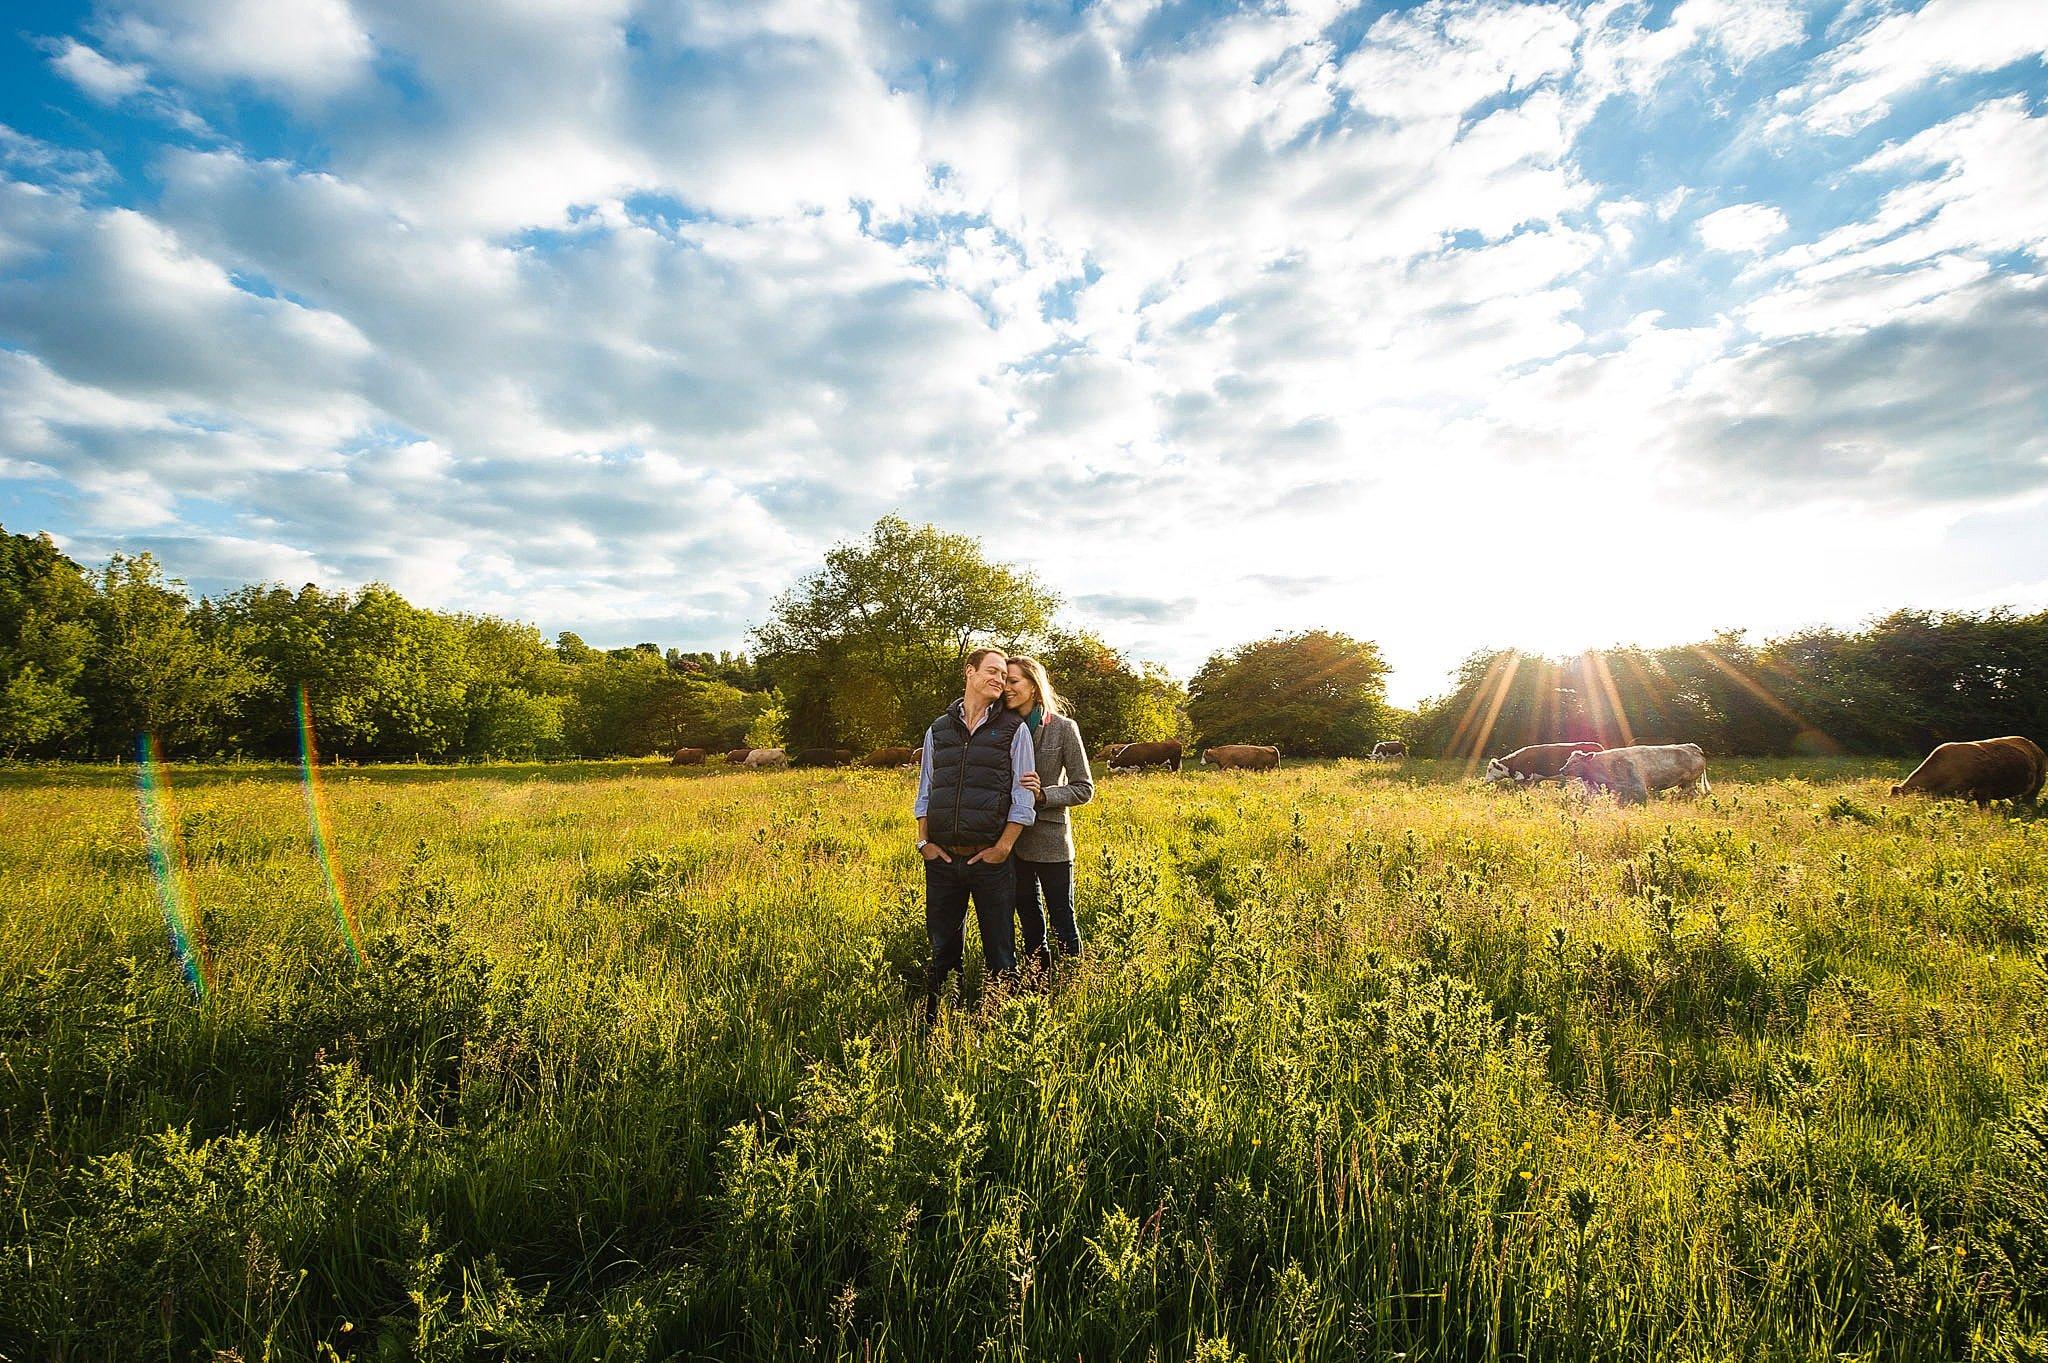 hereford-wedding-photographer (11)